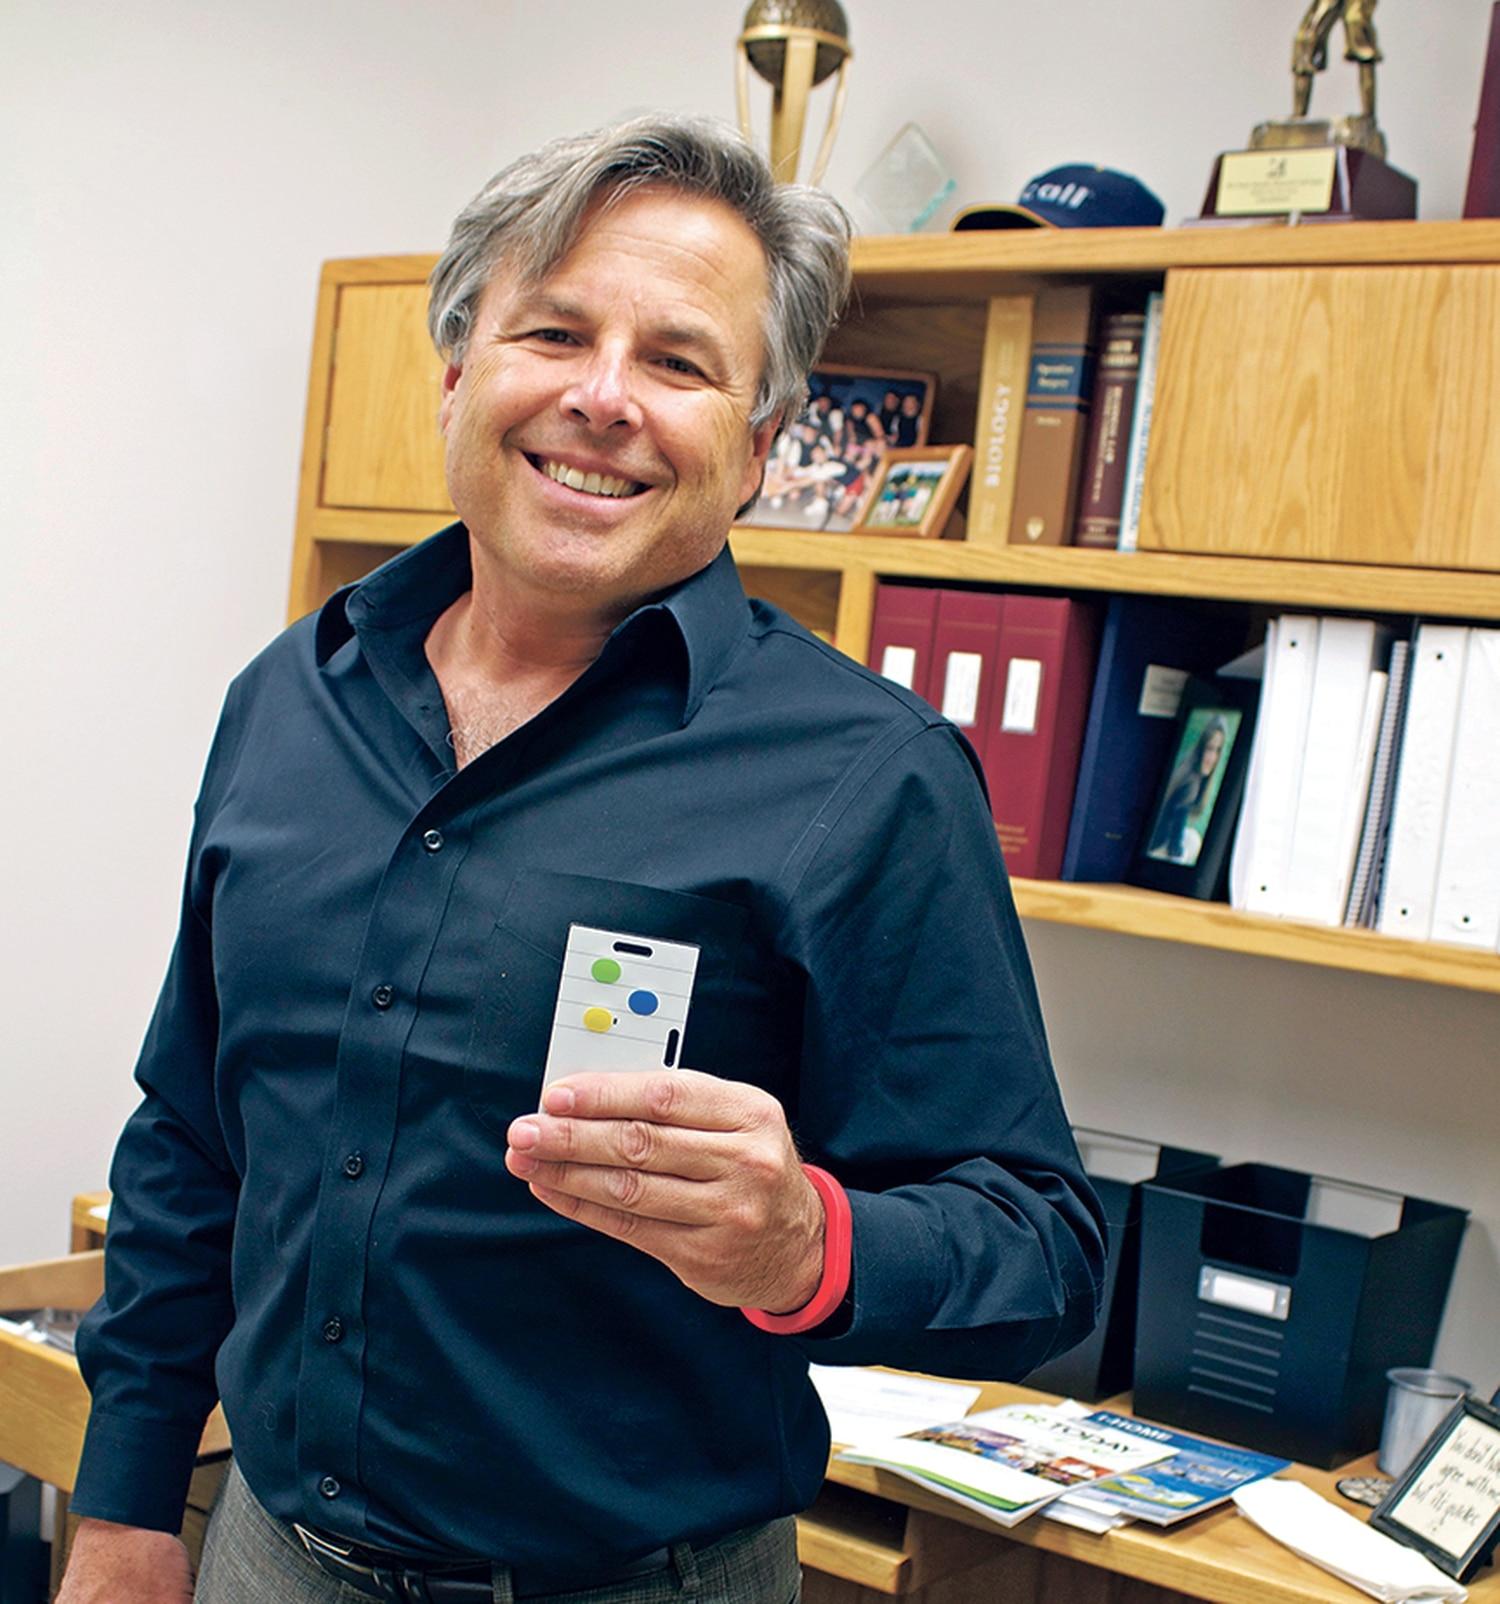 CEO Andrew Halasz says electronic sensors can help hospitals run better.